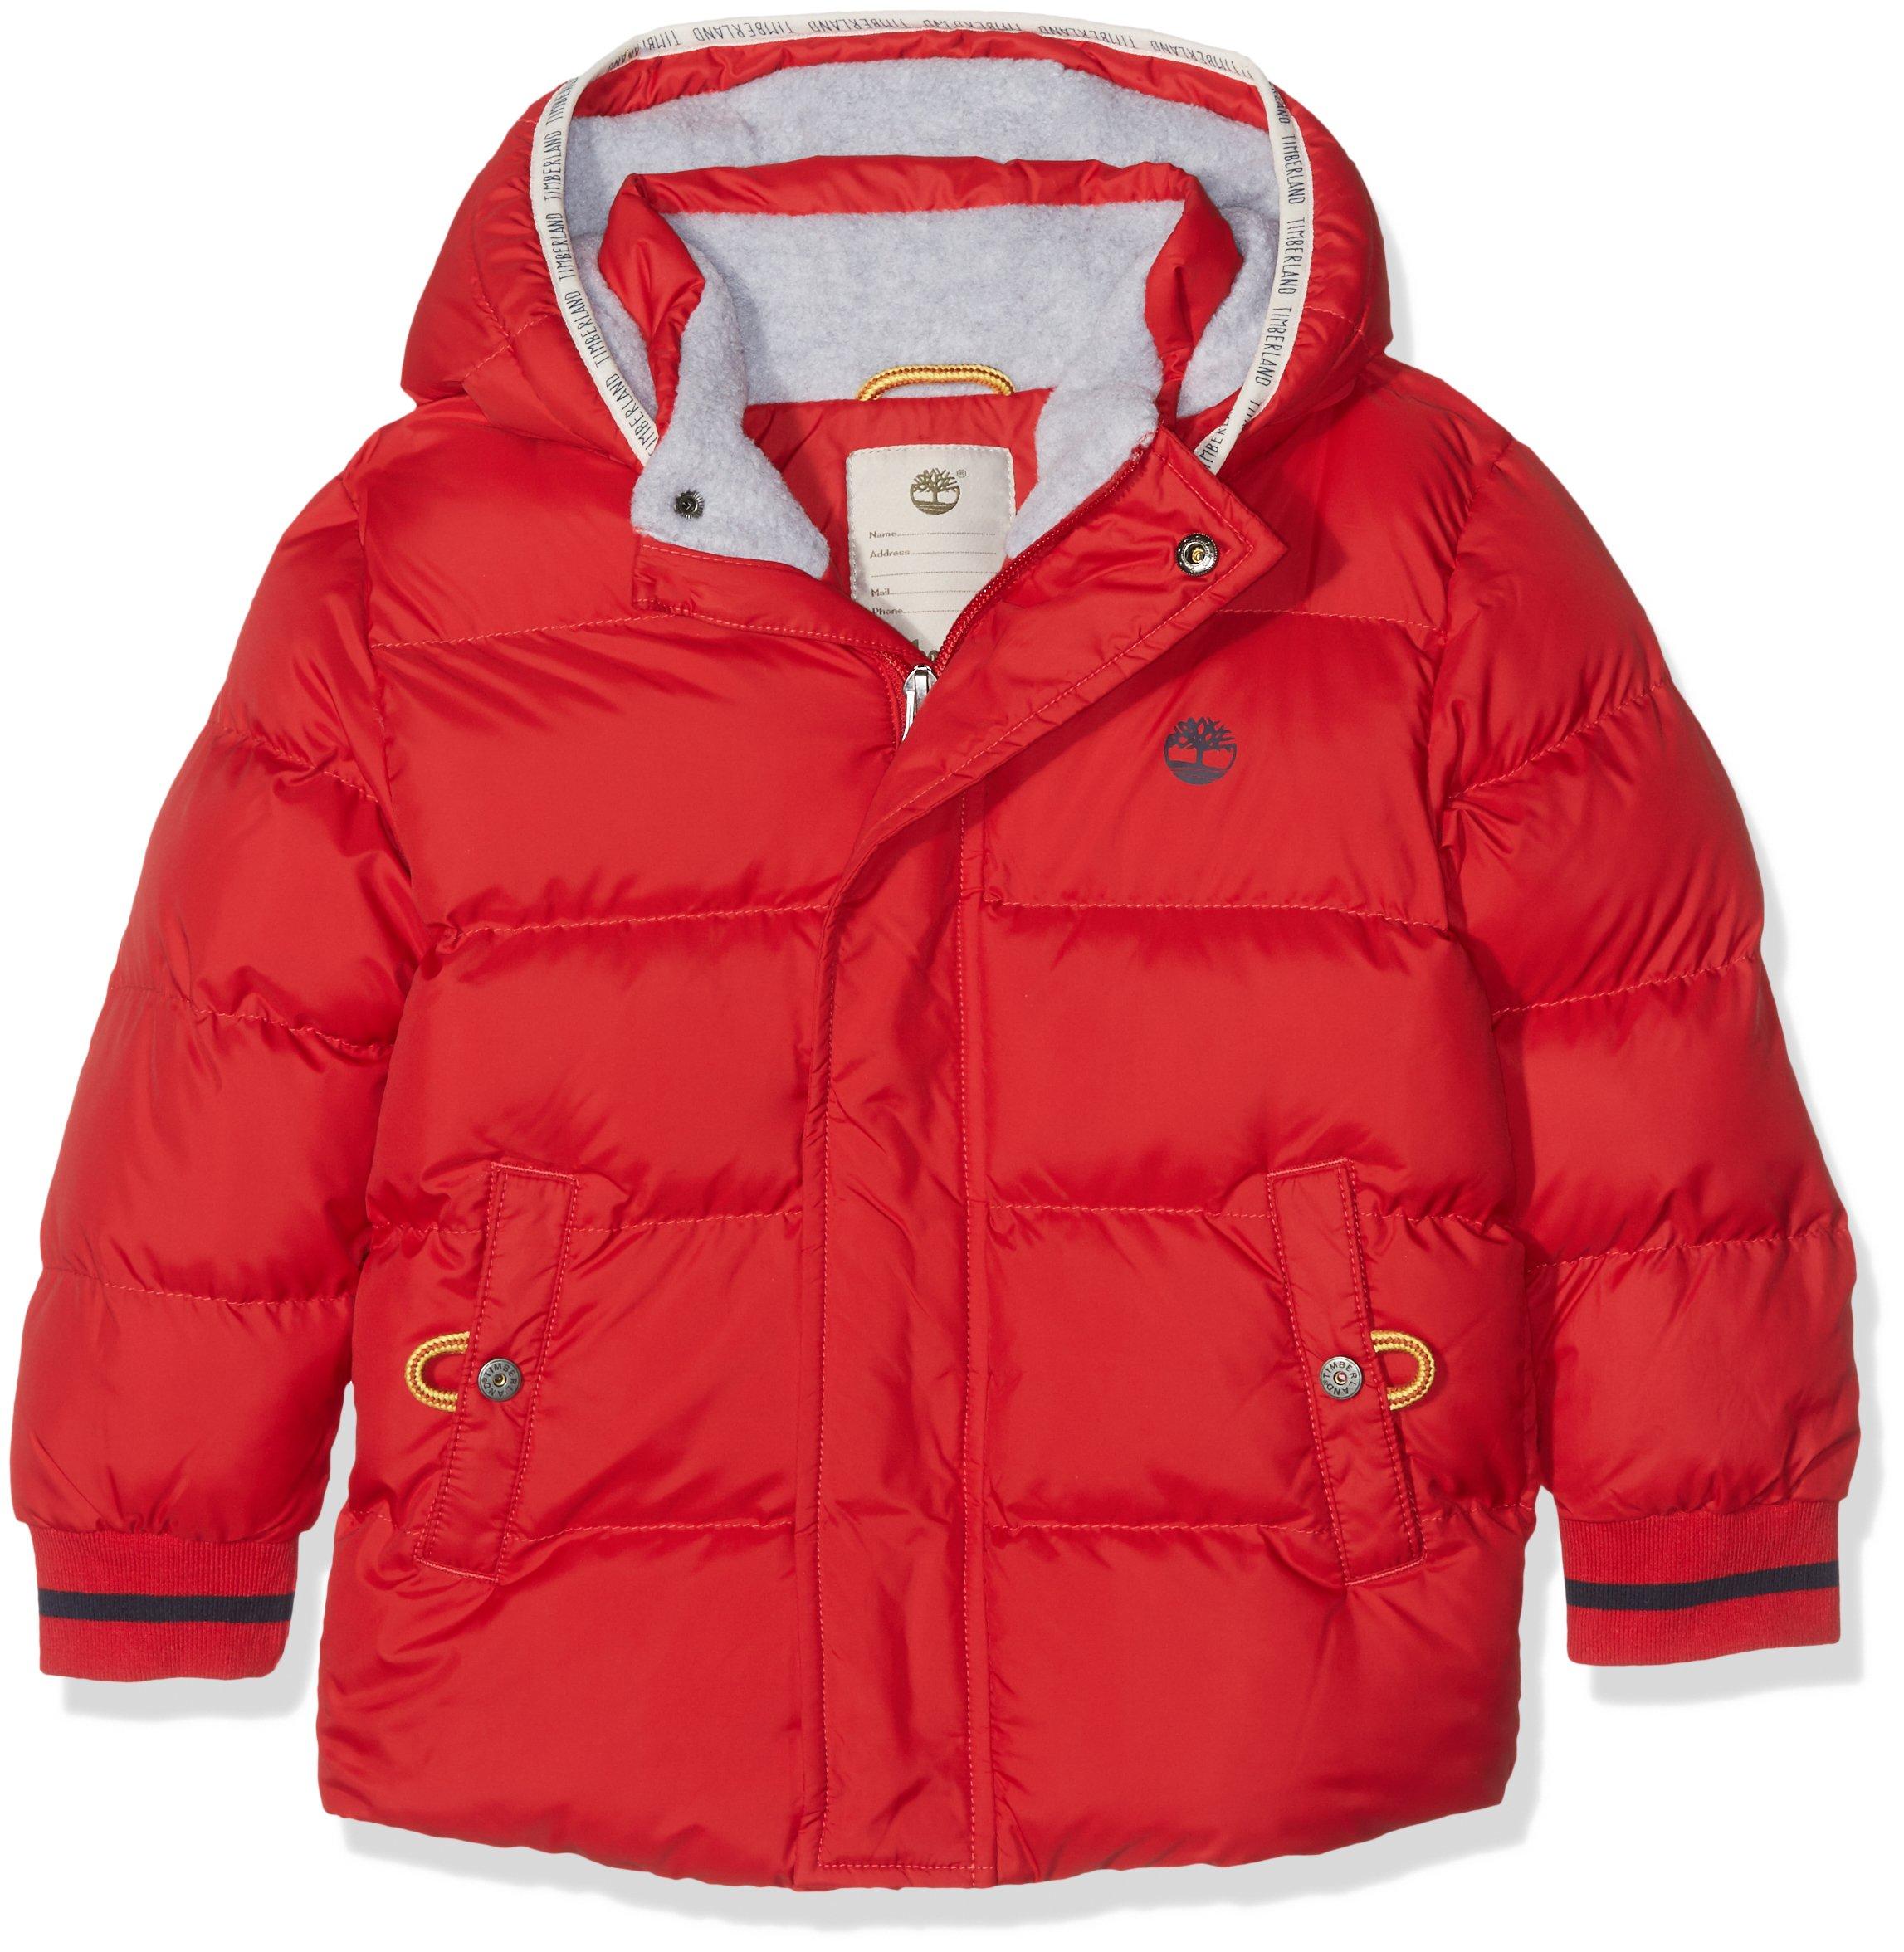 Timberland Boys Doudoune Jacket